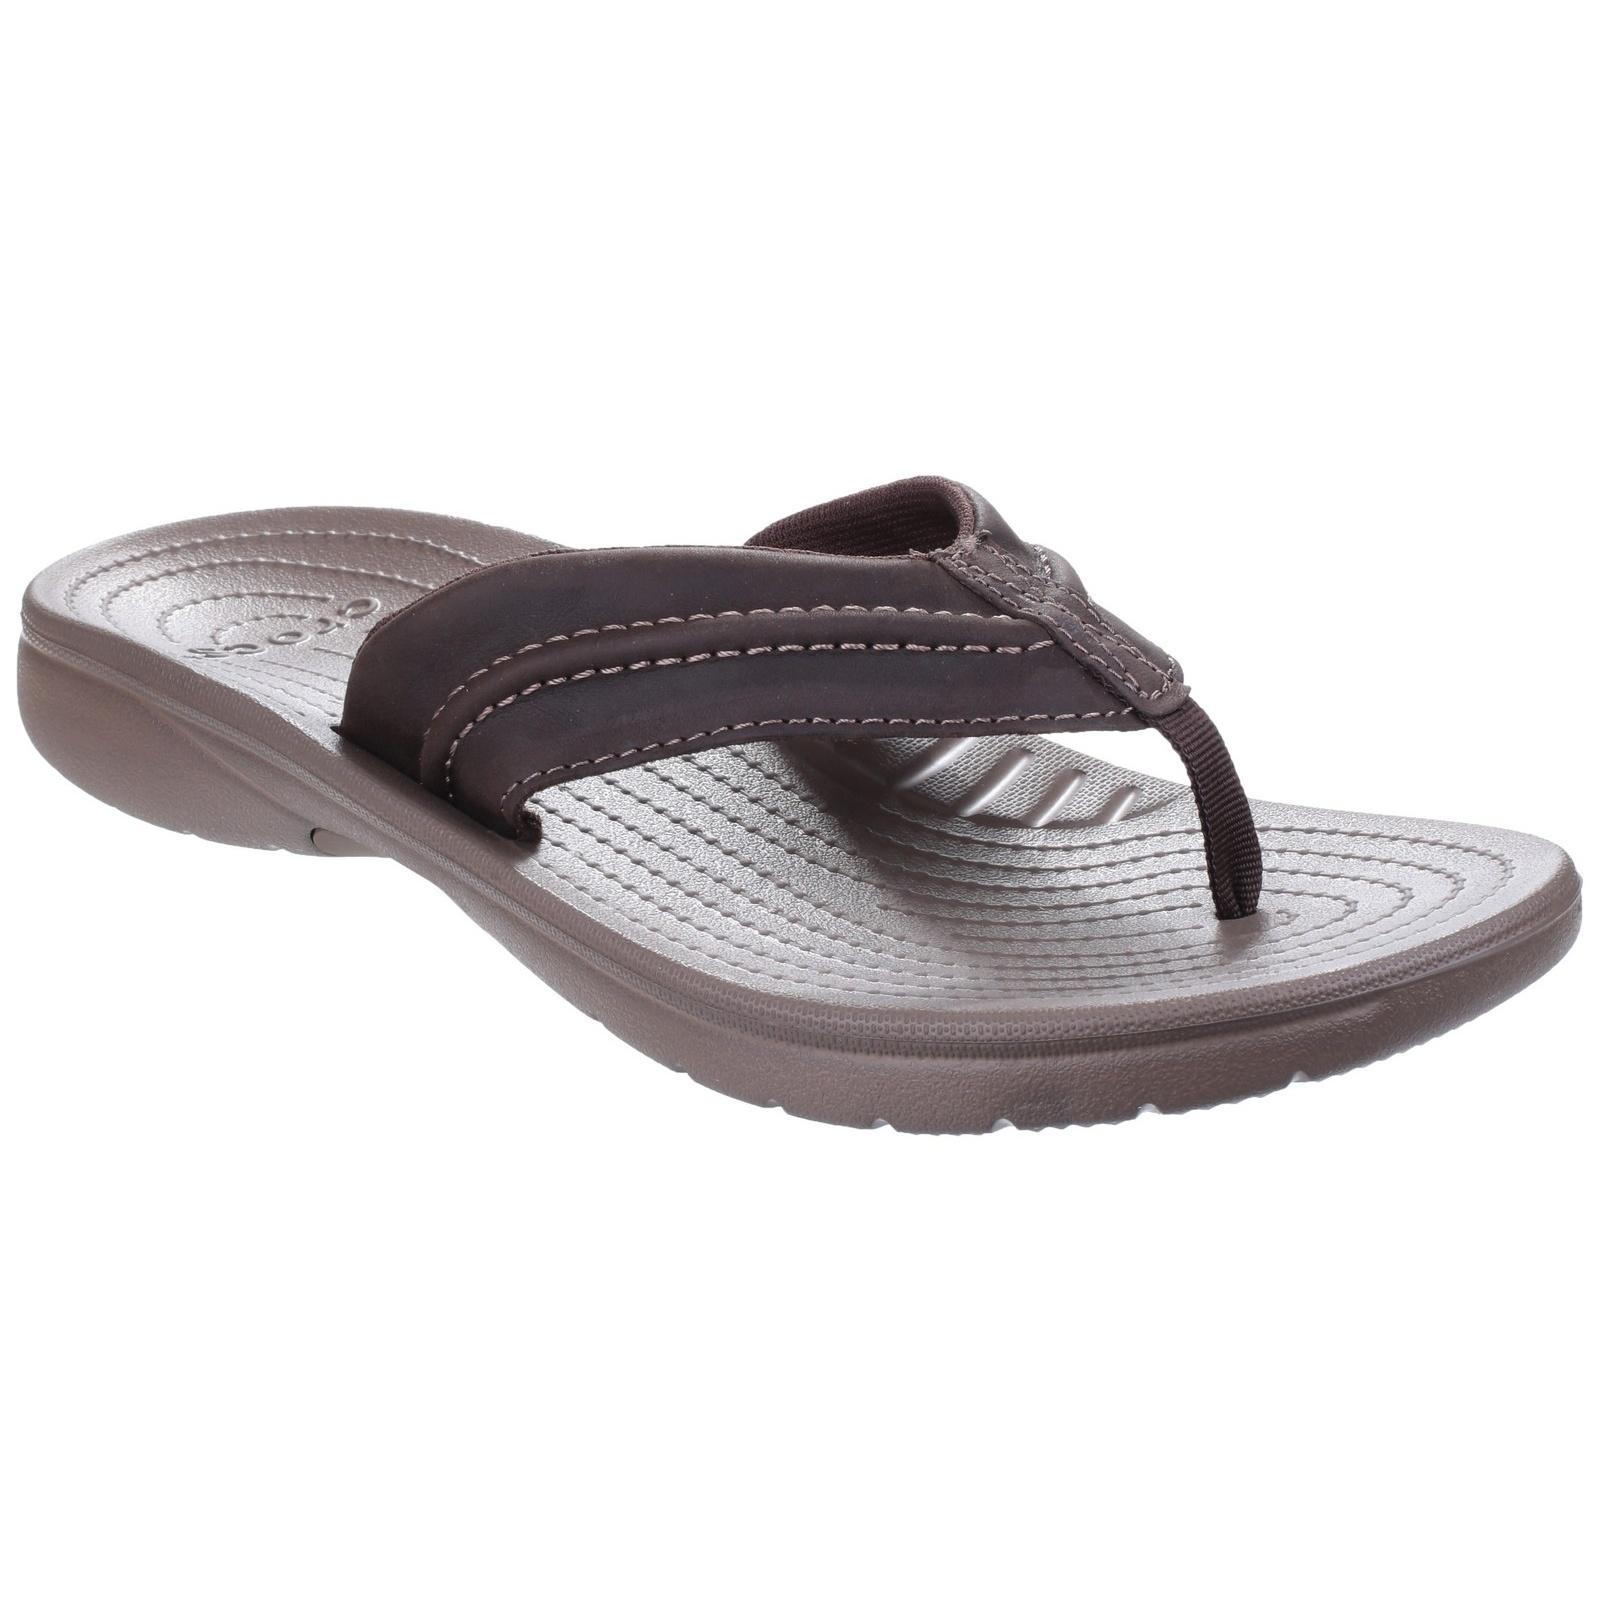 93e91b292d5d92 Summary -  Amazoncom Crocs Mens Yukon Mesa Flipflop Sandals